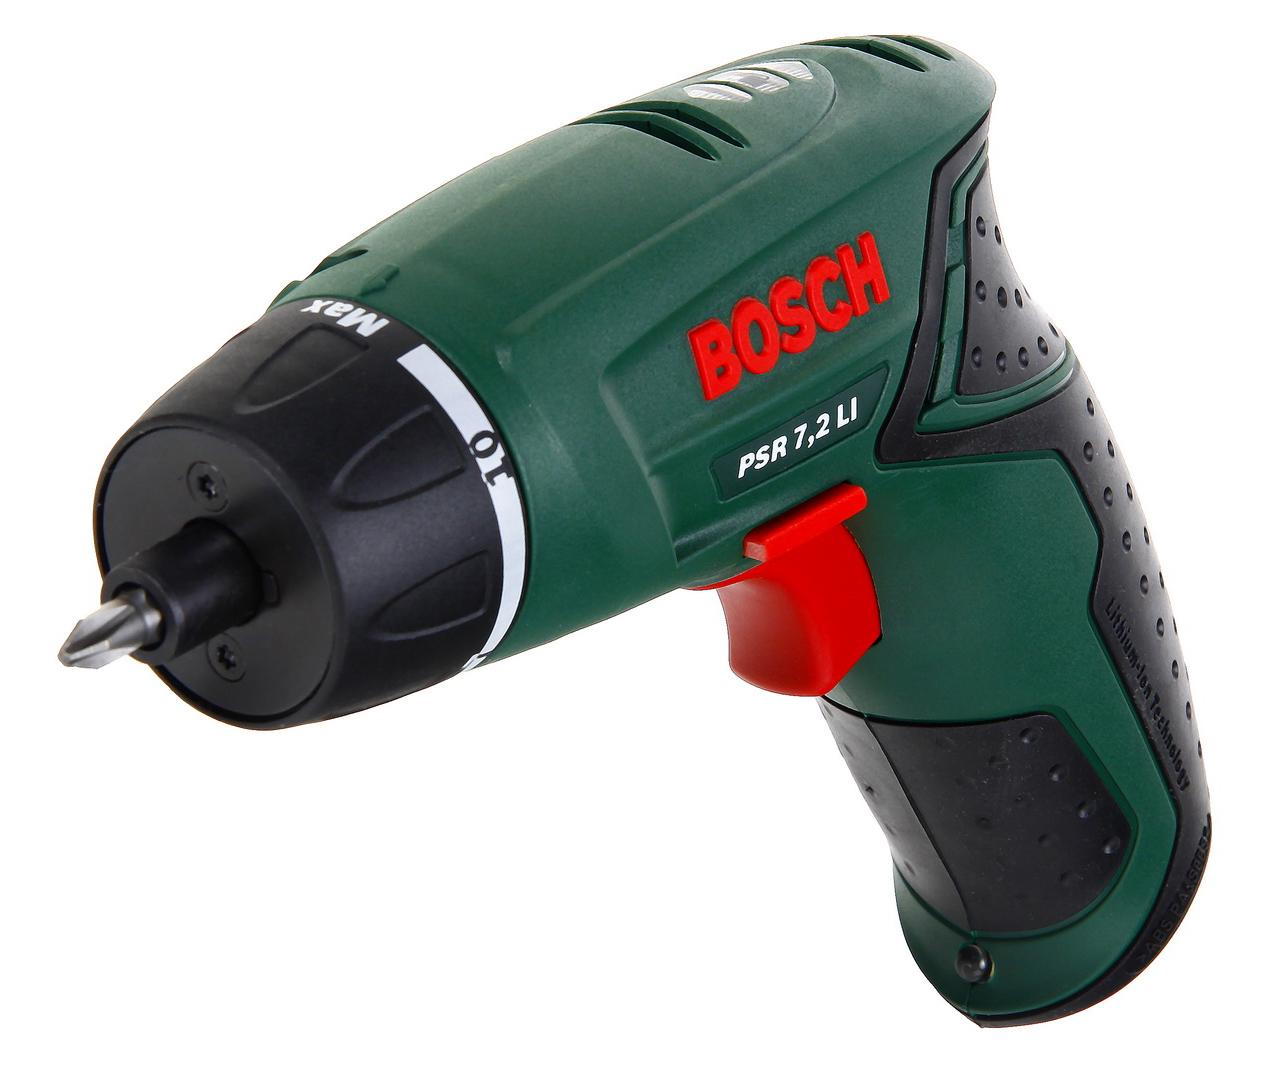 Отвертка аккумуляторная Bosch Psr 7,2 li (0.603.957.720) аккумуляторная сабельная ножовка bosch gsa 10 8v li 0 601 64l 902